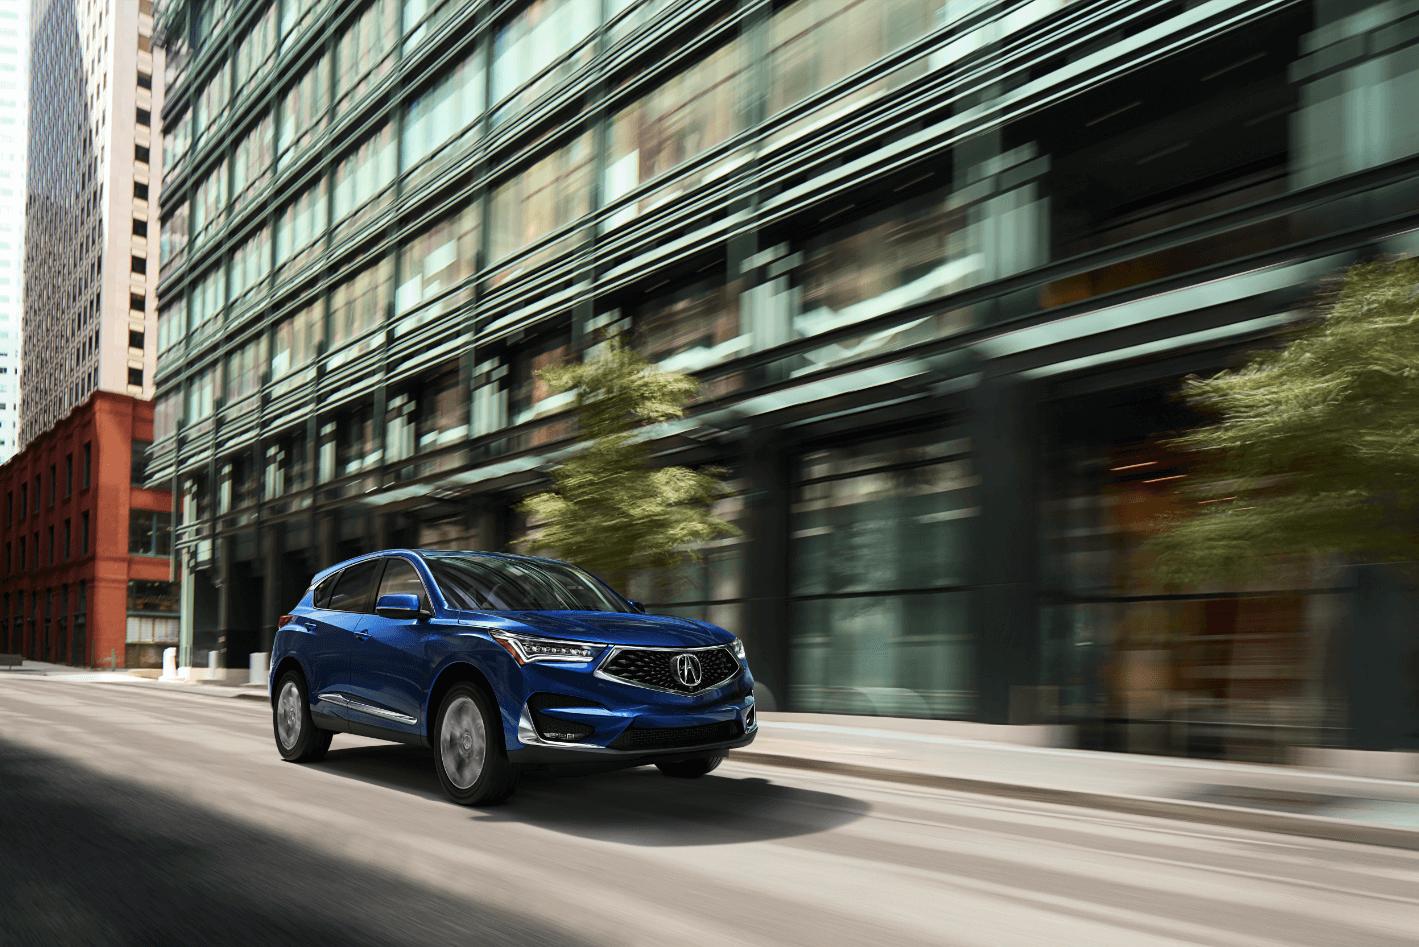 2020 Acura RDX Advance in Fathom Blue Pearl